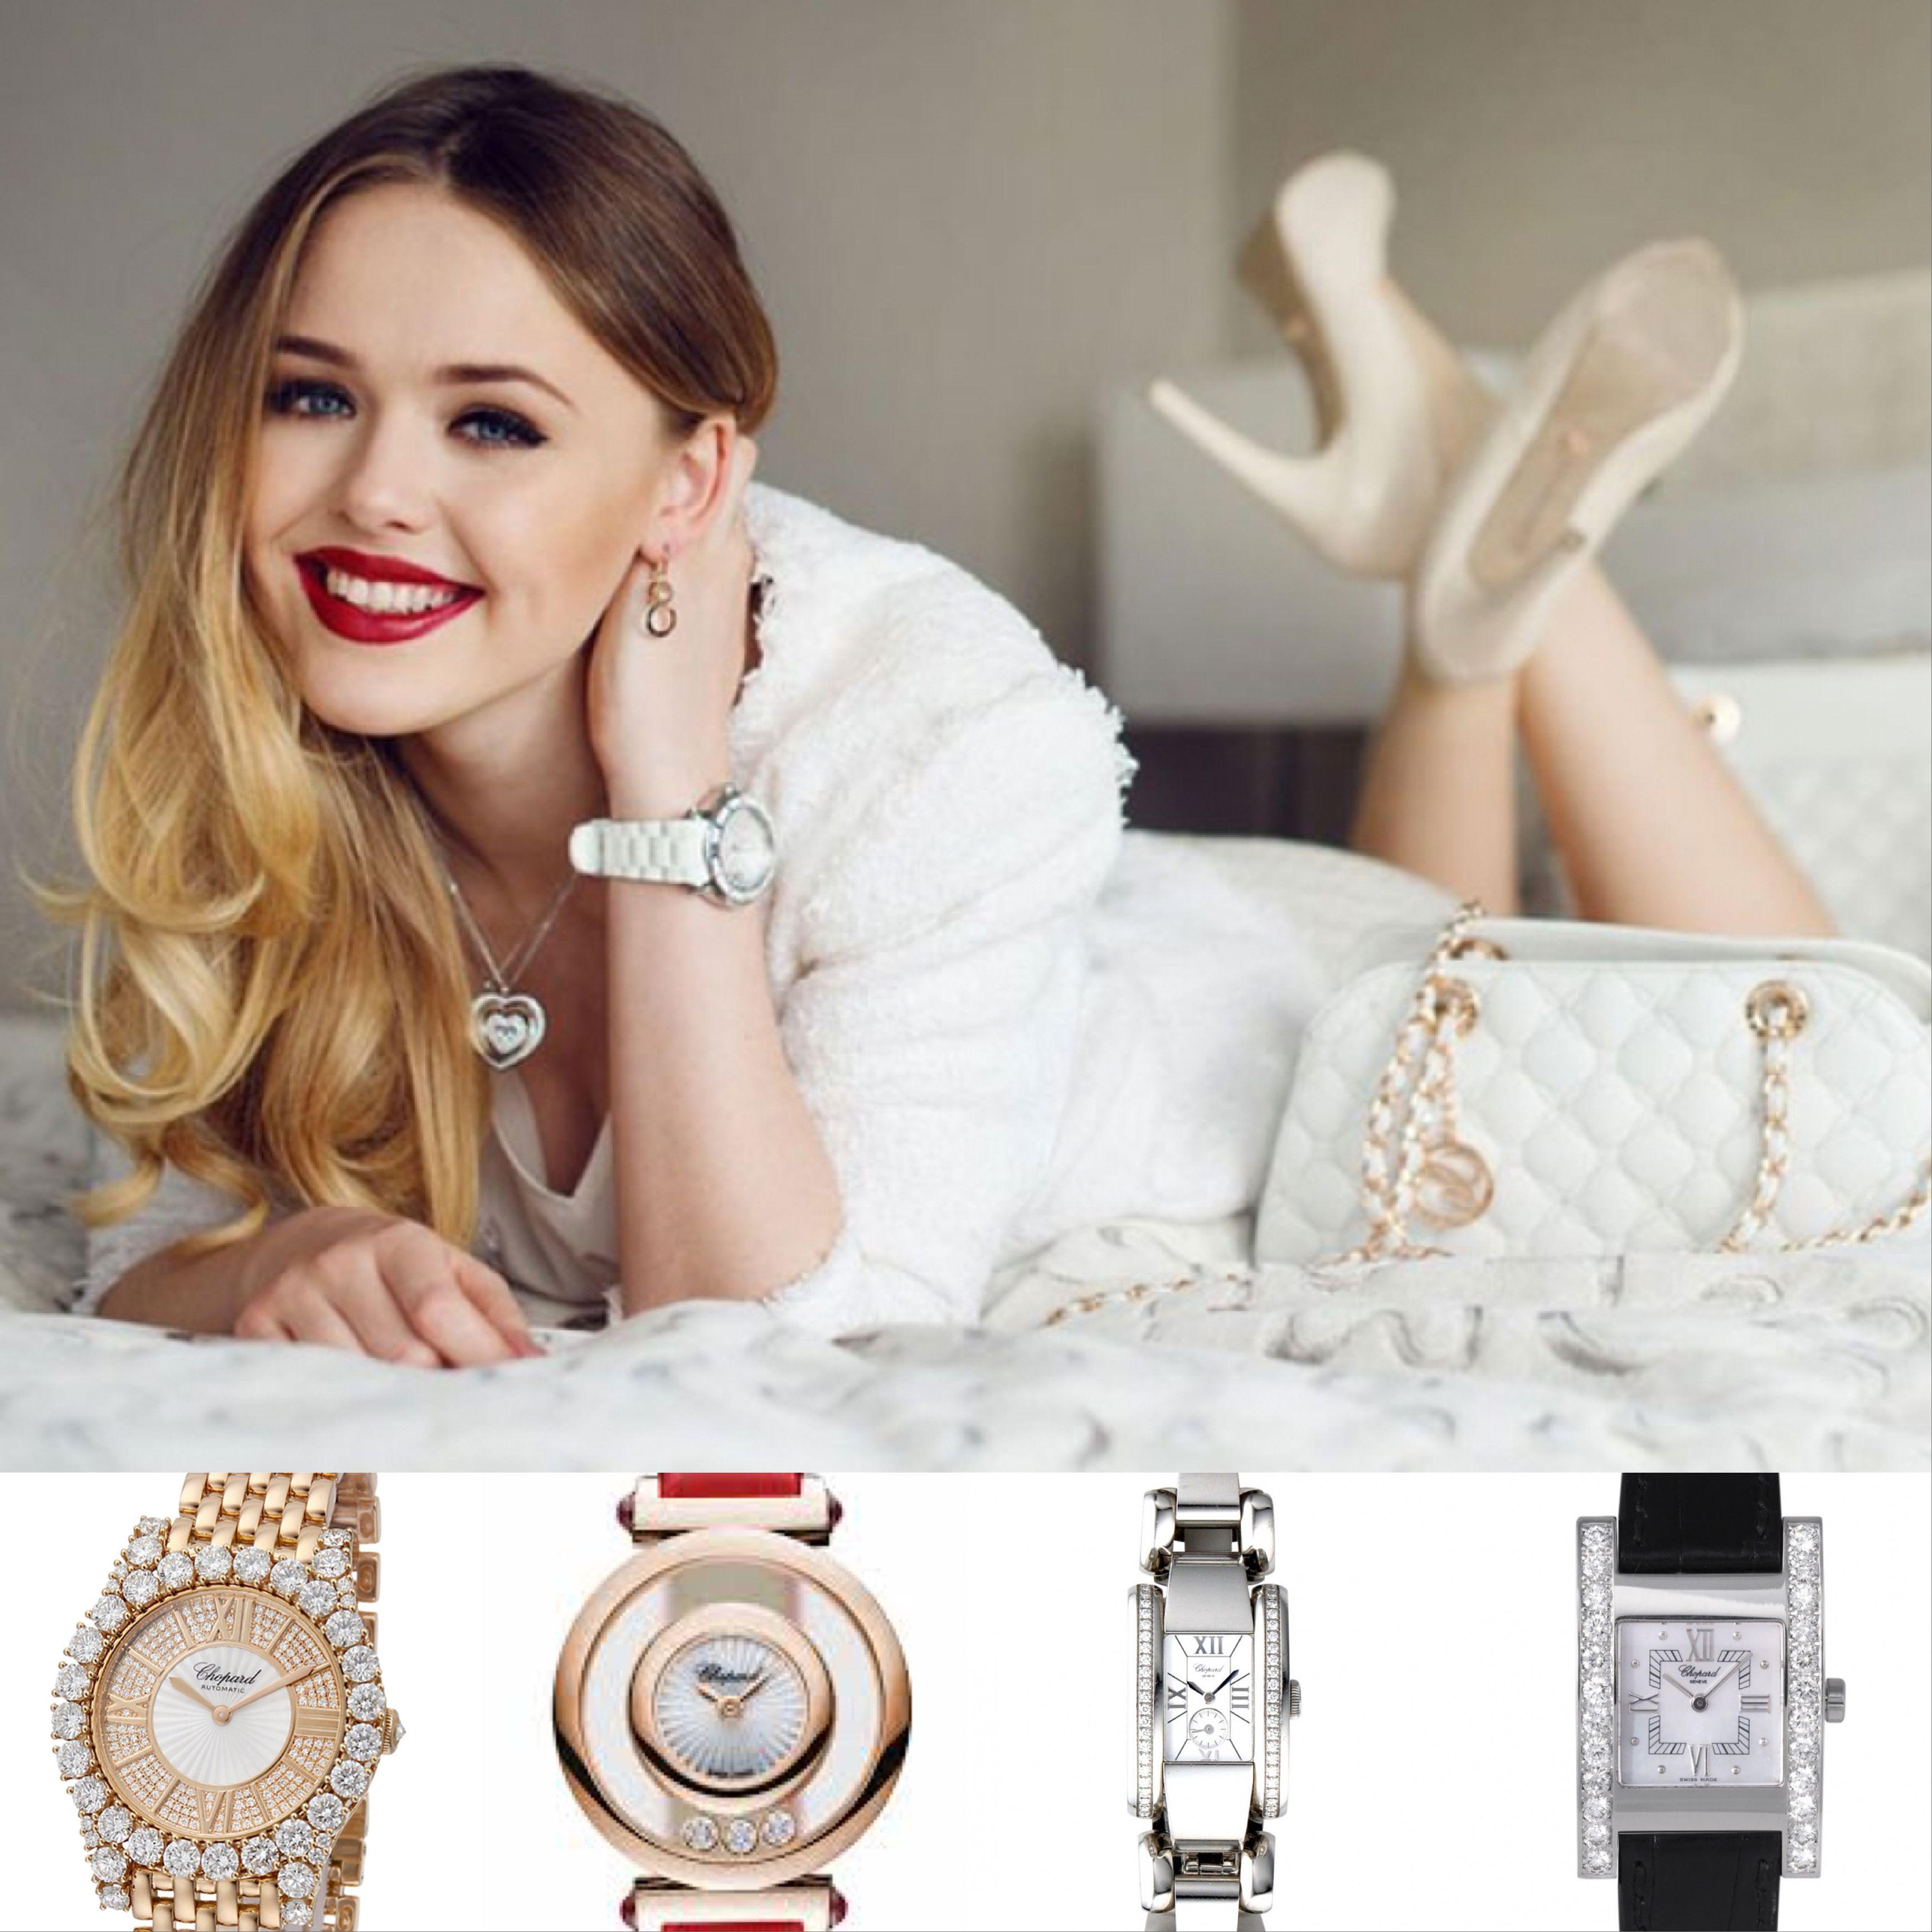 Wendy James Rocking White Mini Dress | Wendy james, Dress